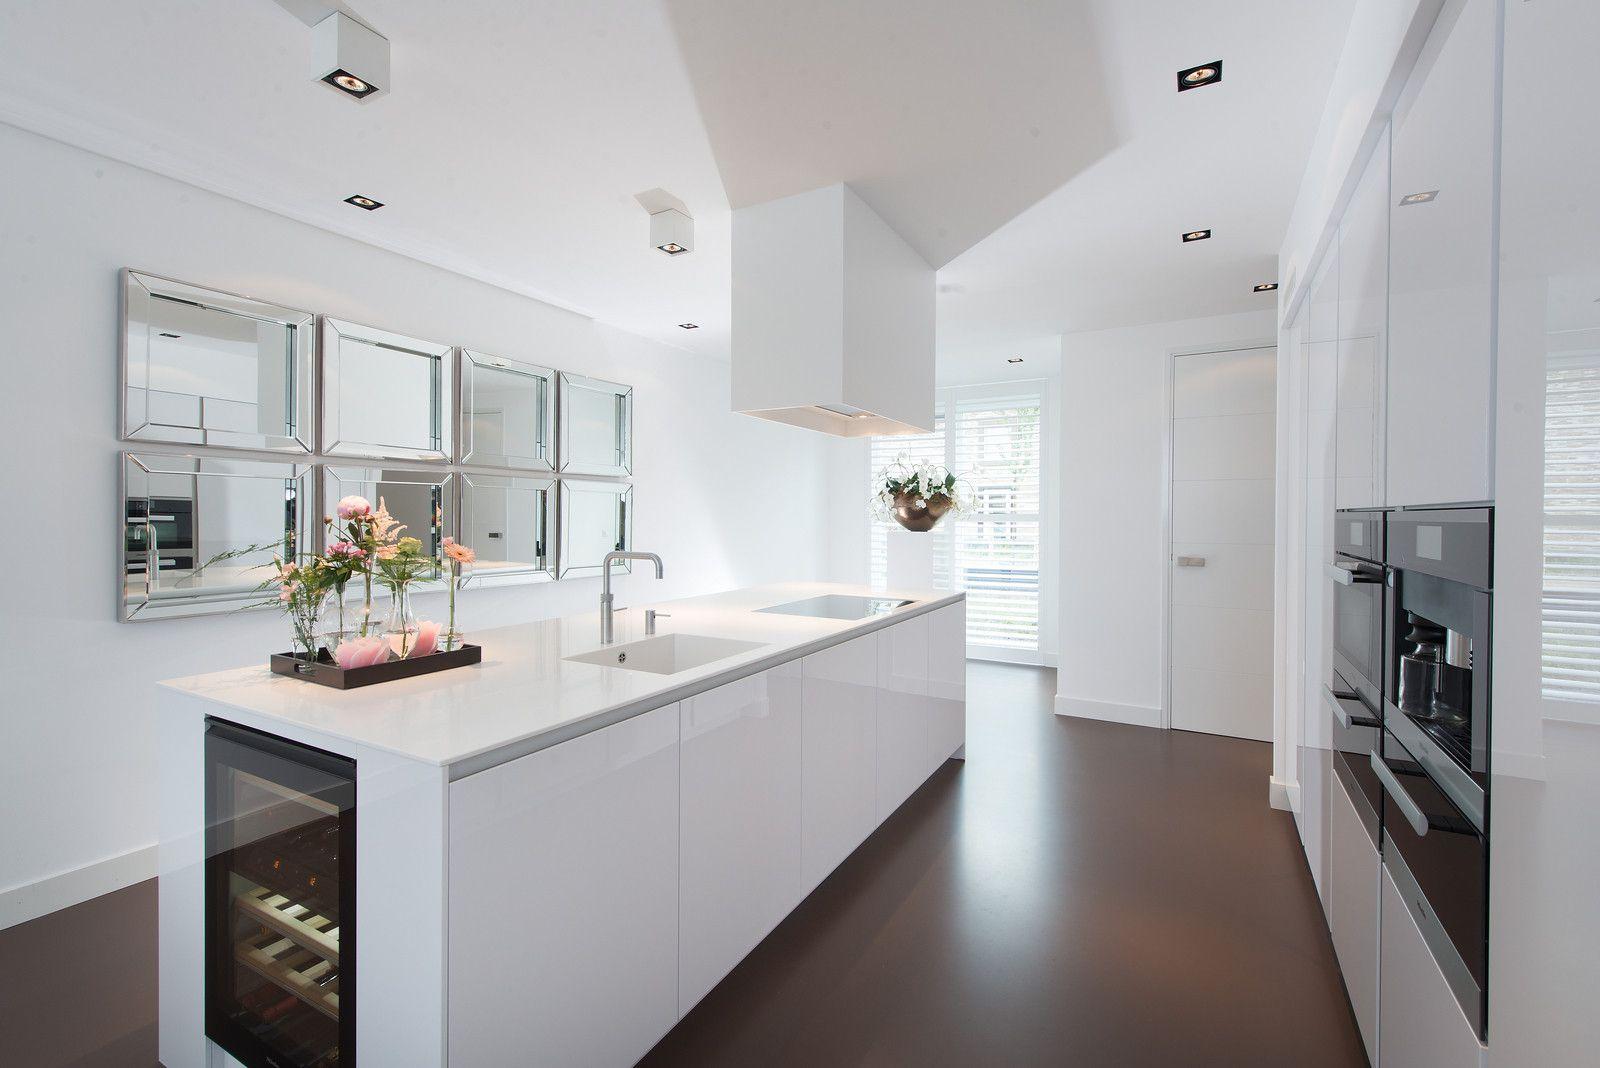 Witte Keuken Design : Witte design keuken snaidero way via tieleman keukens modern